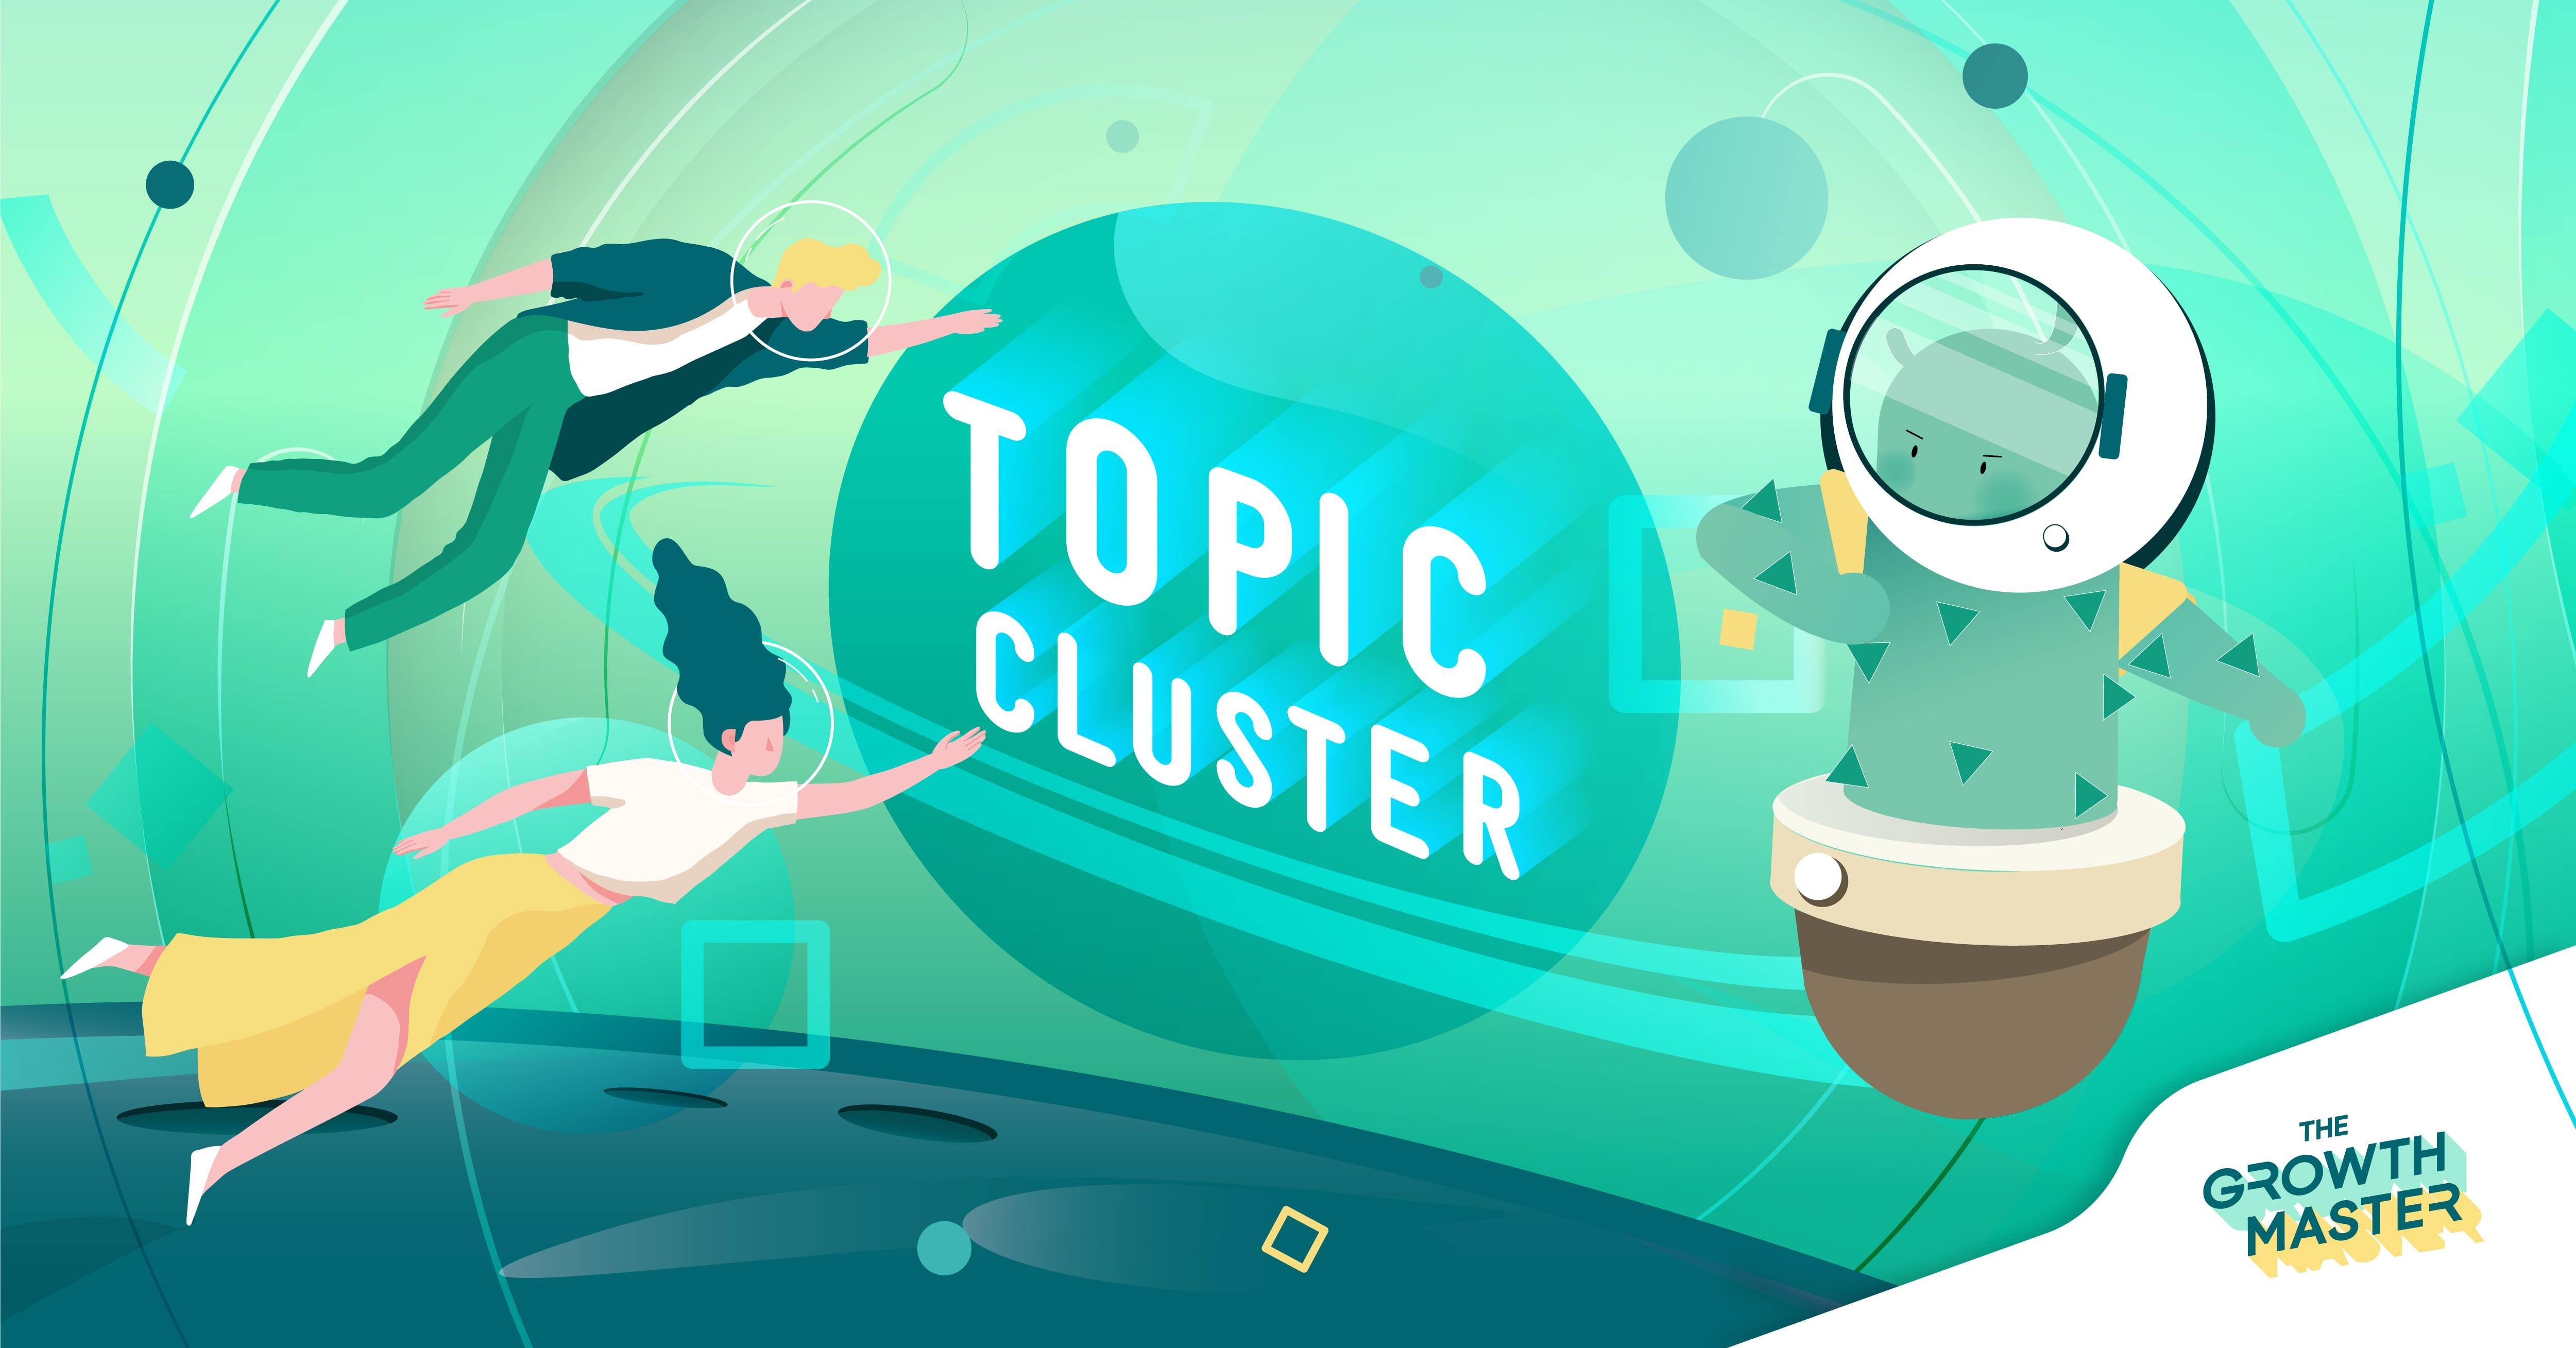 Topic Cluster คืออะไร ? ทำไมถึงสำคัญต่อการทำ SEO บนเว็บไซต์คุณ